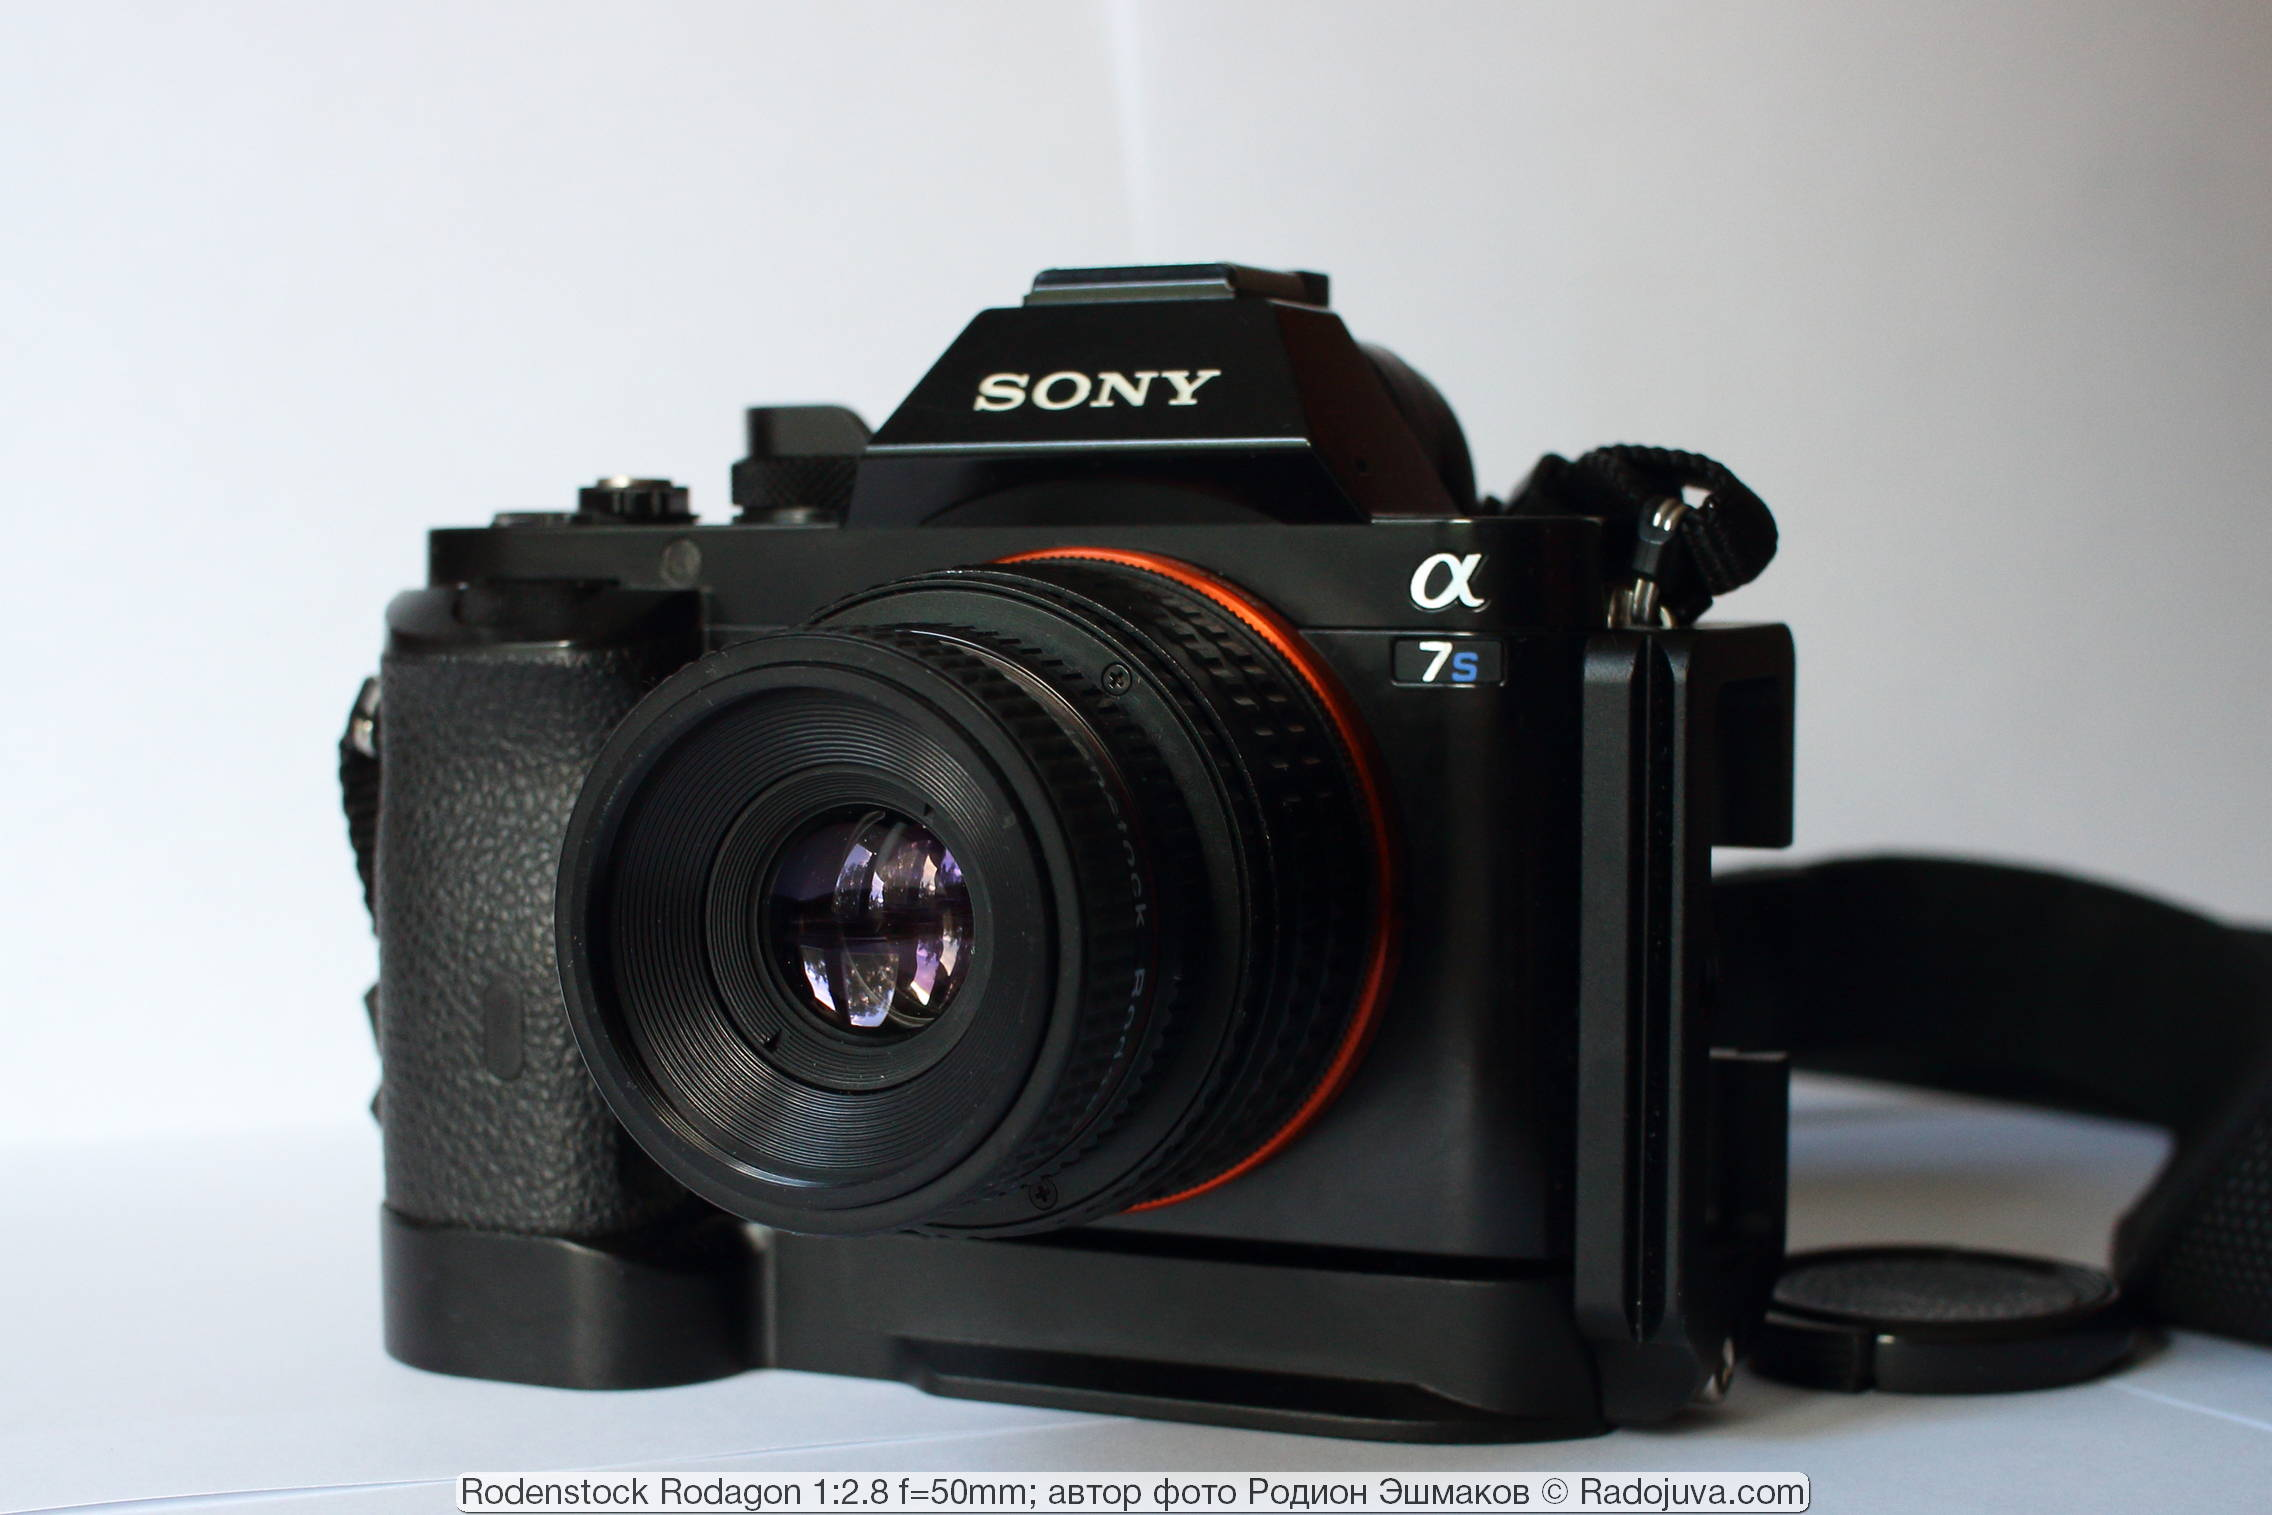 Rodenstock Rodagon на камере Sony A7s.